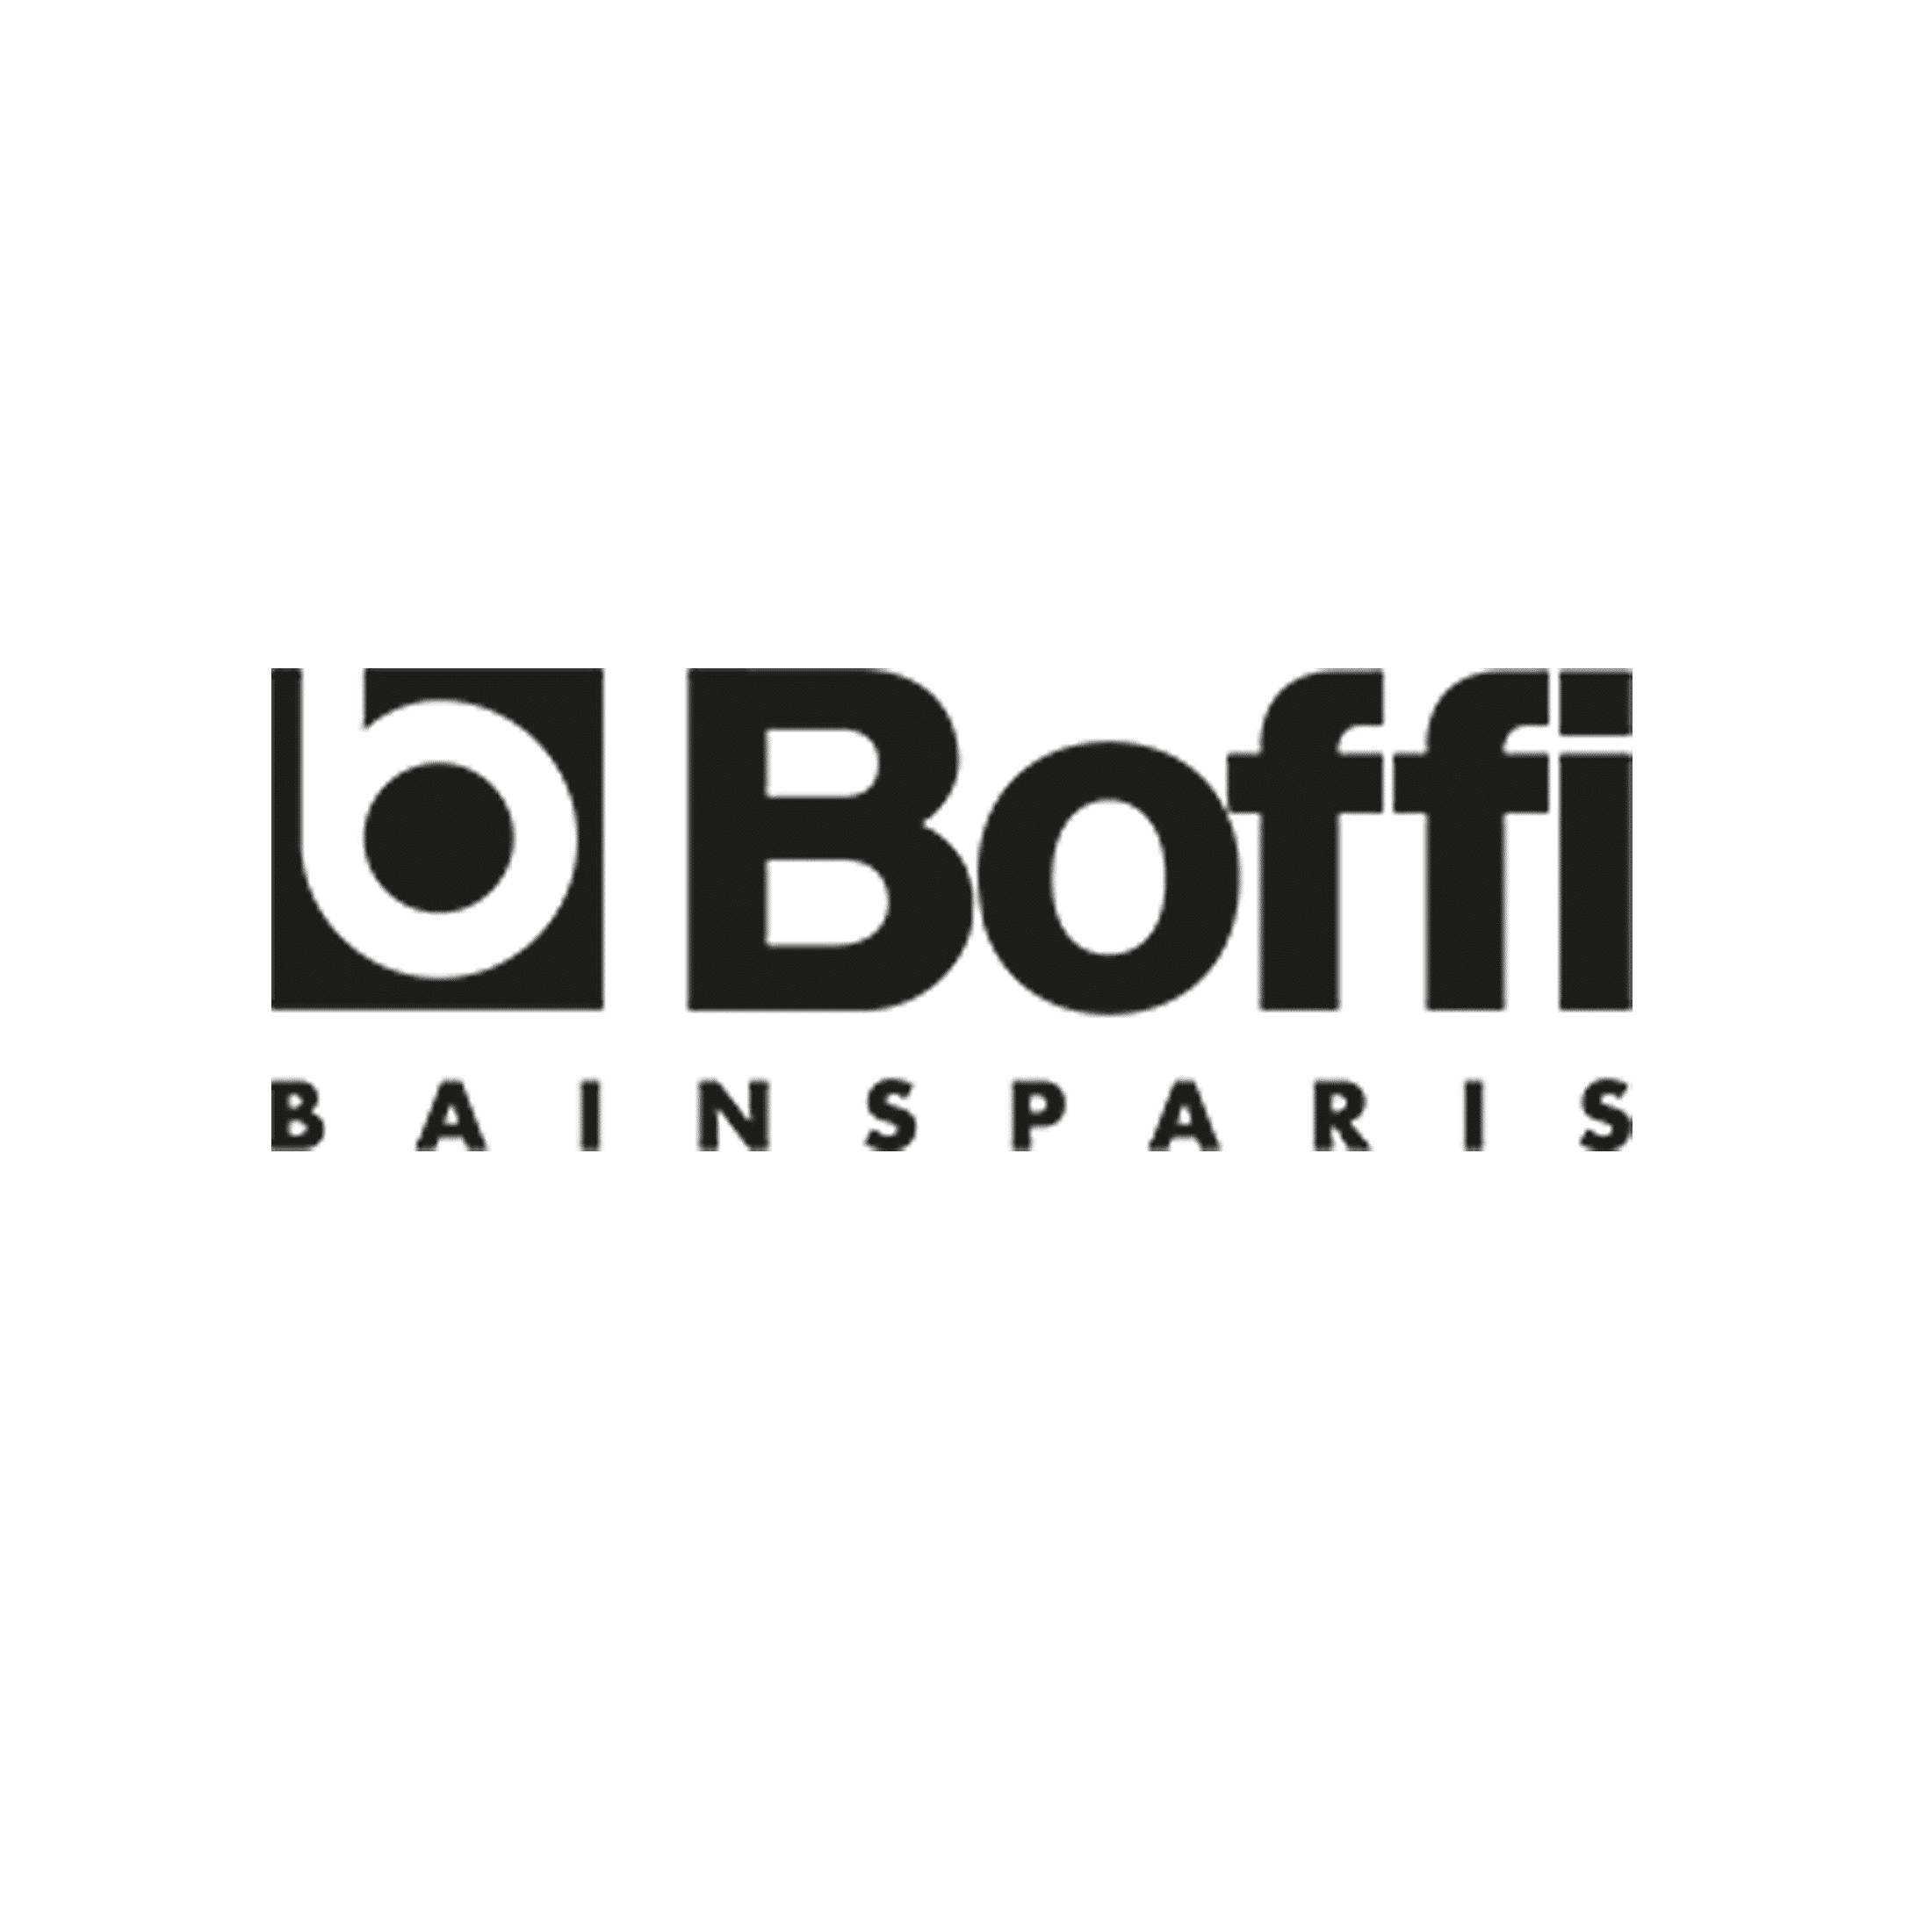 LOGO-BOFFI